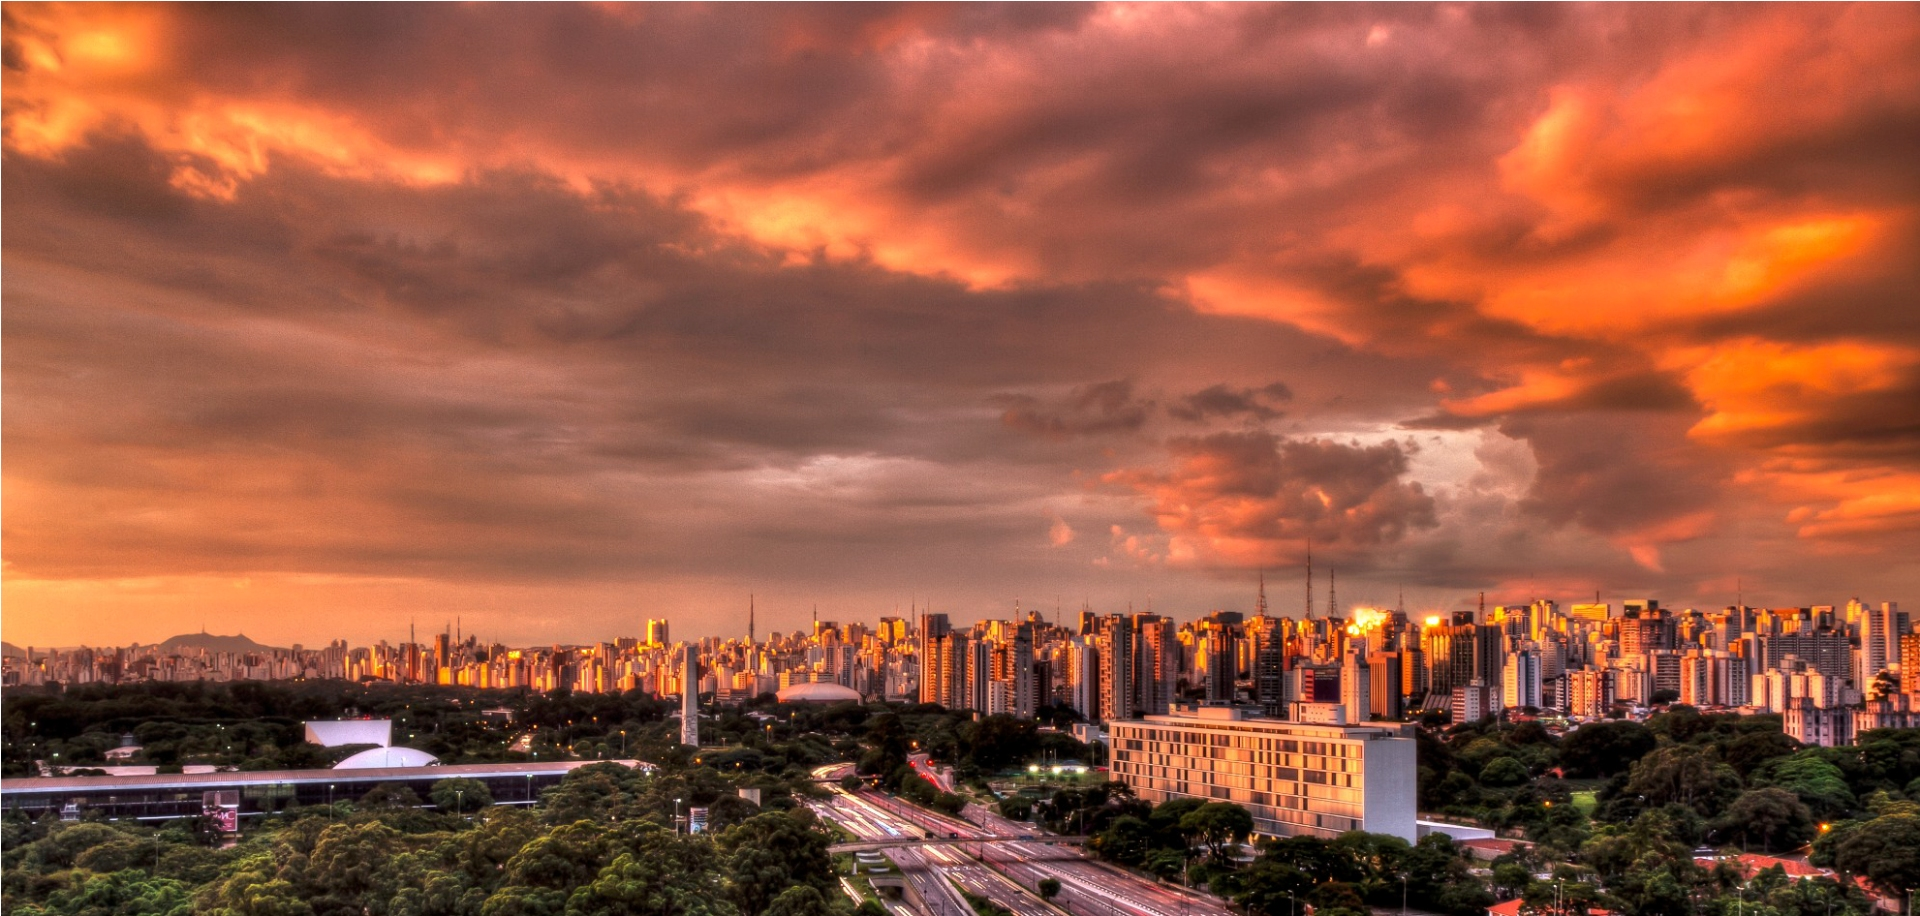 Sao-Paulo-Pictures-Beautiful-City-of-Brazil-Wallpaper-Sao-Paulo